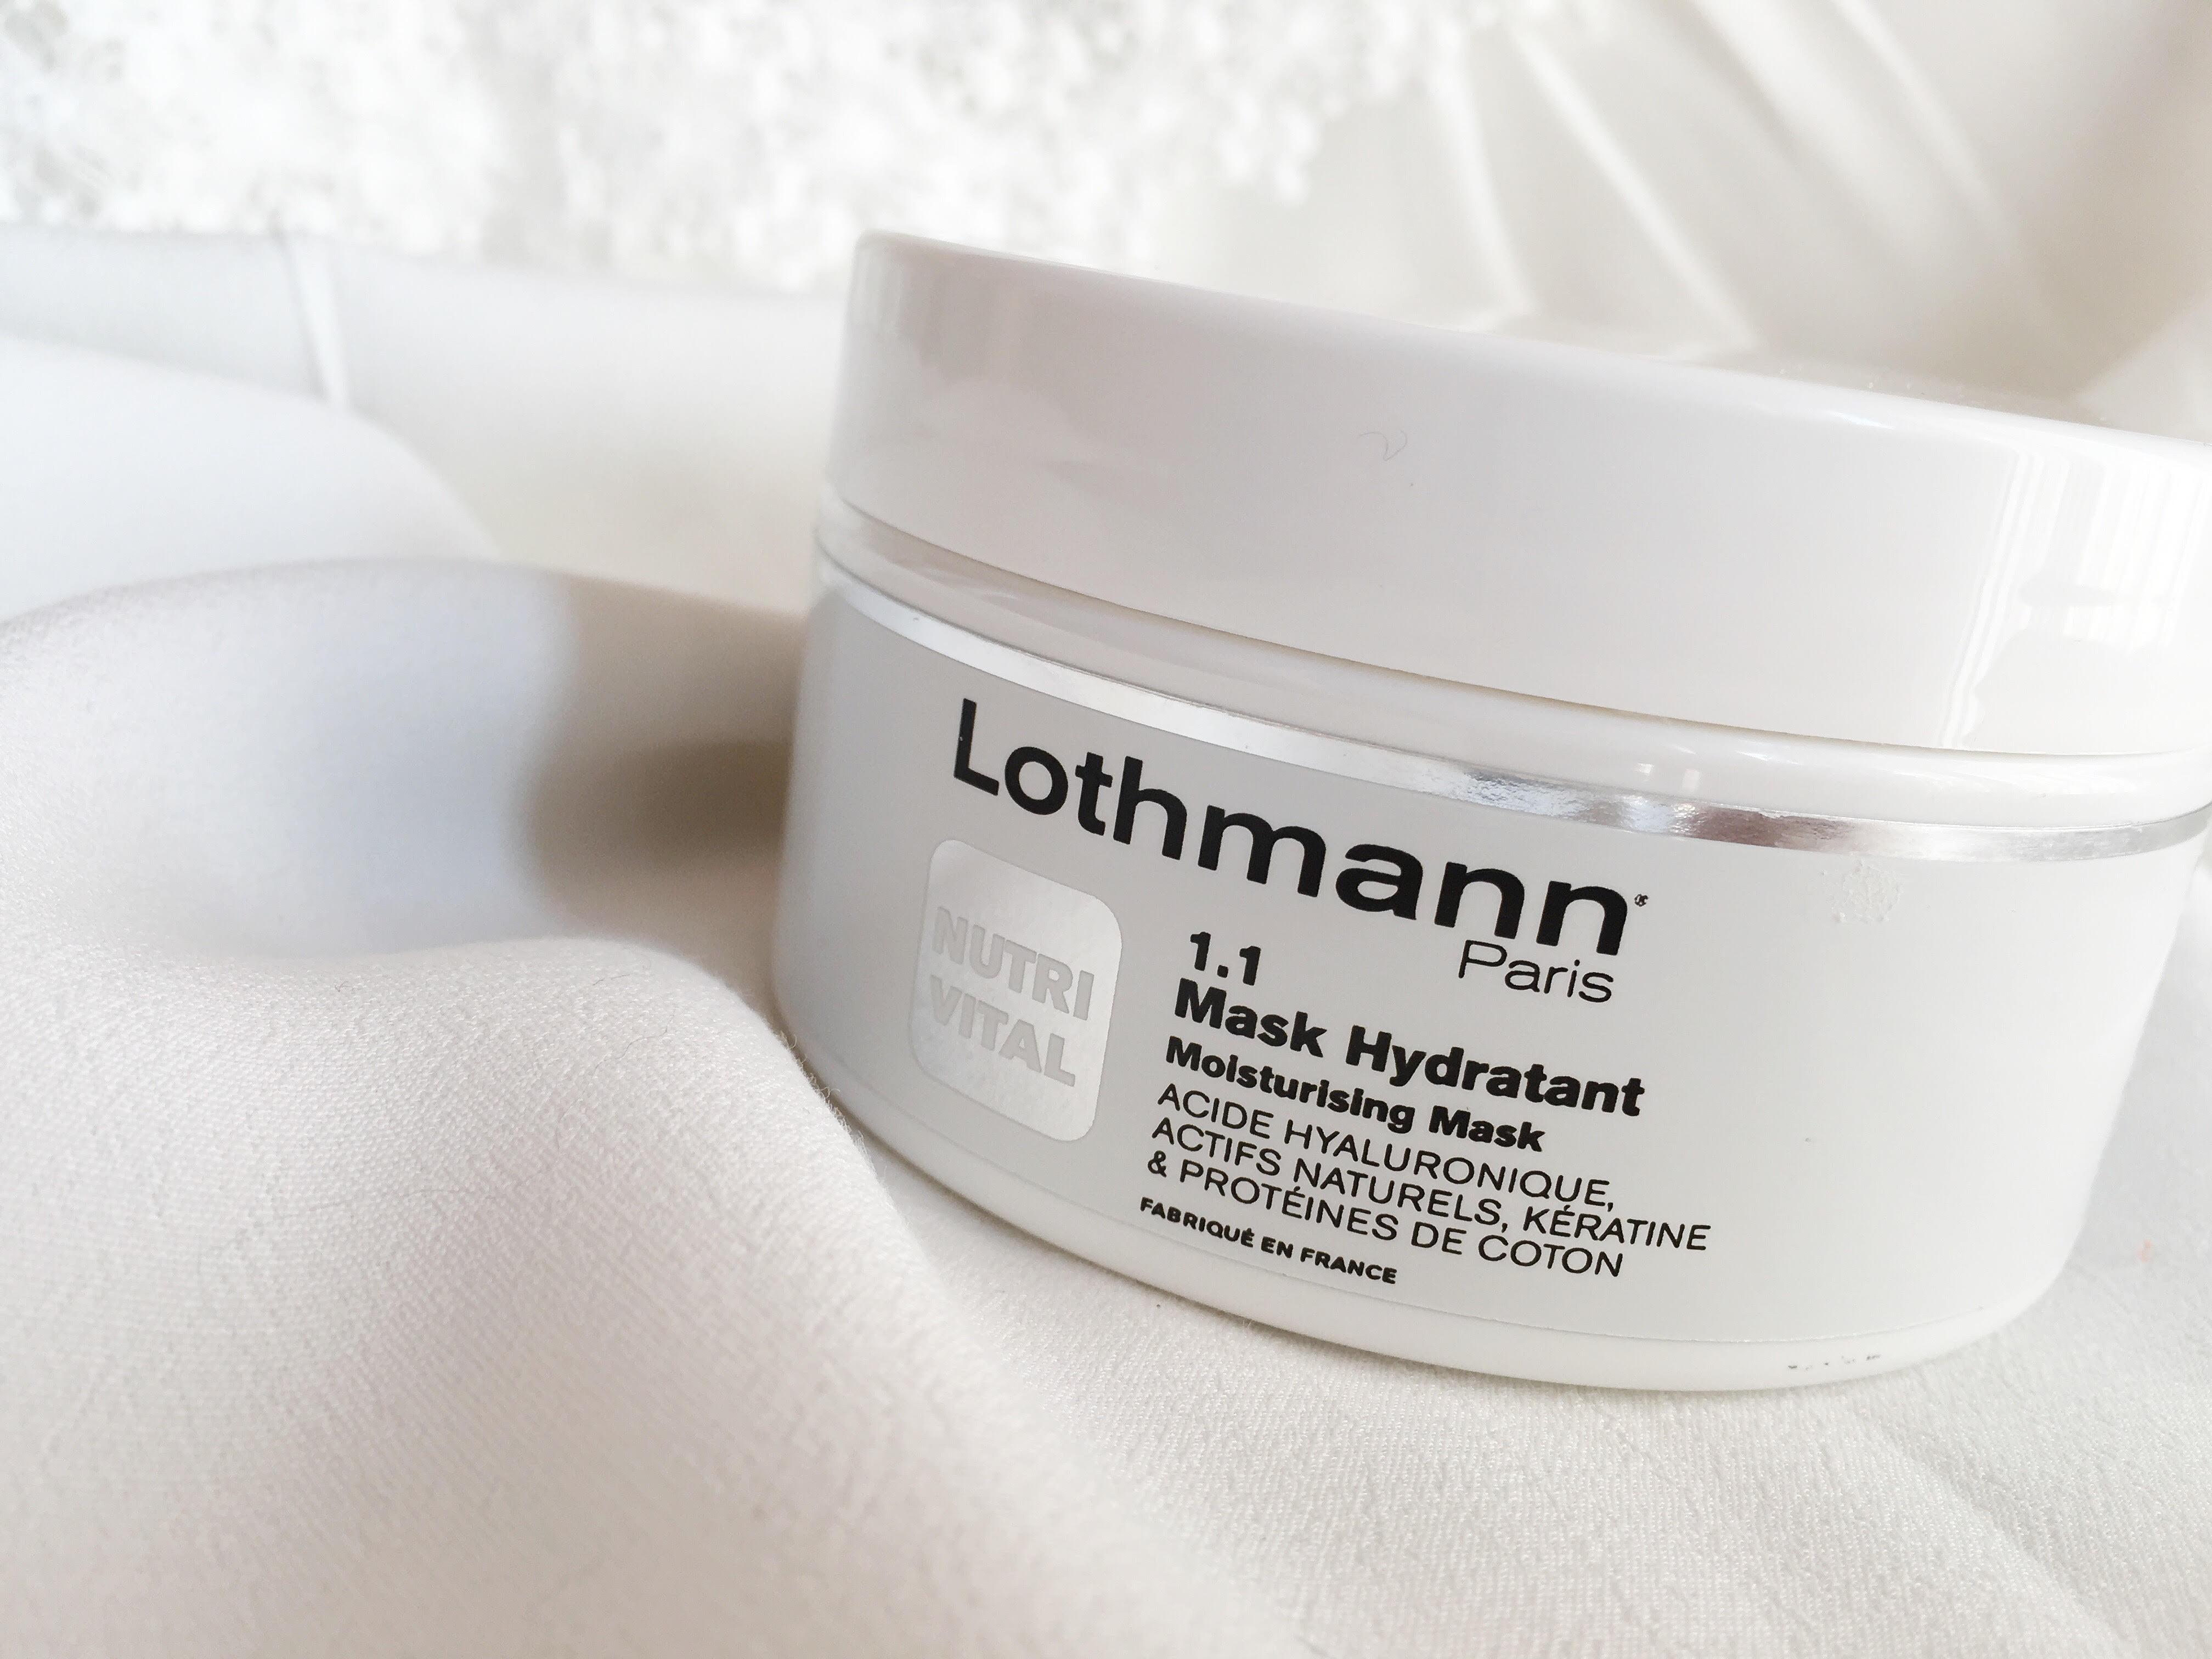 Thierry Lothmann - 3